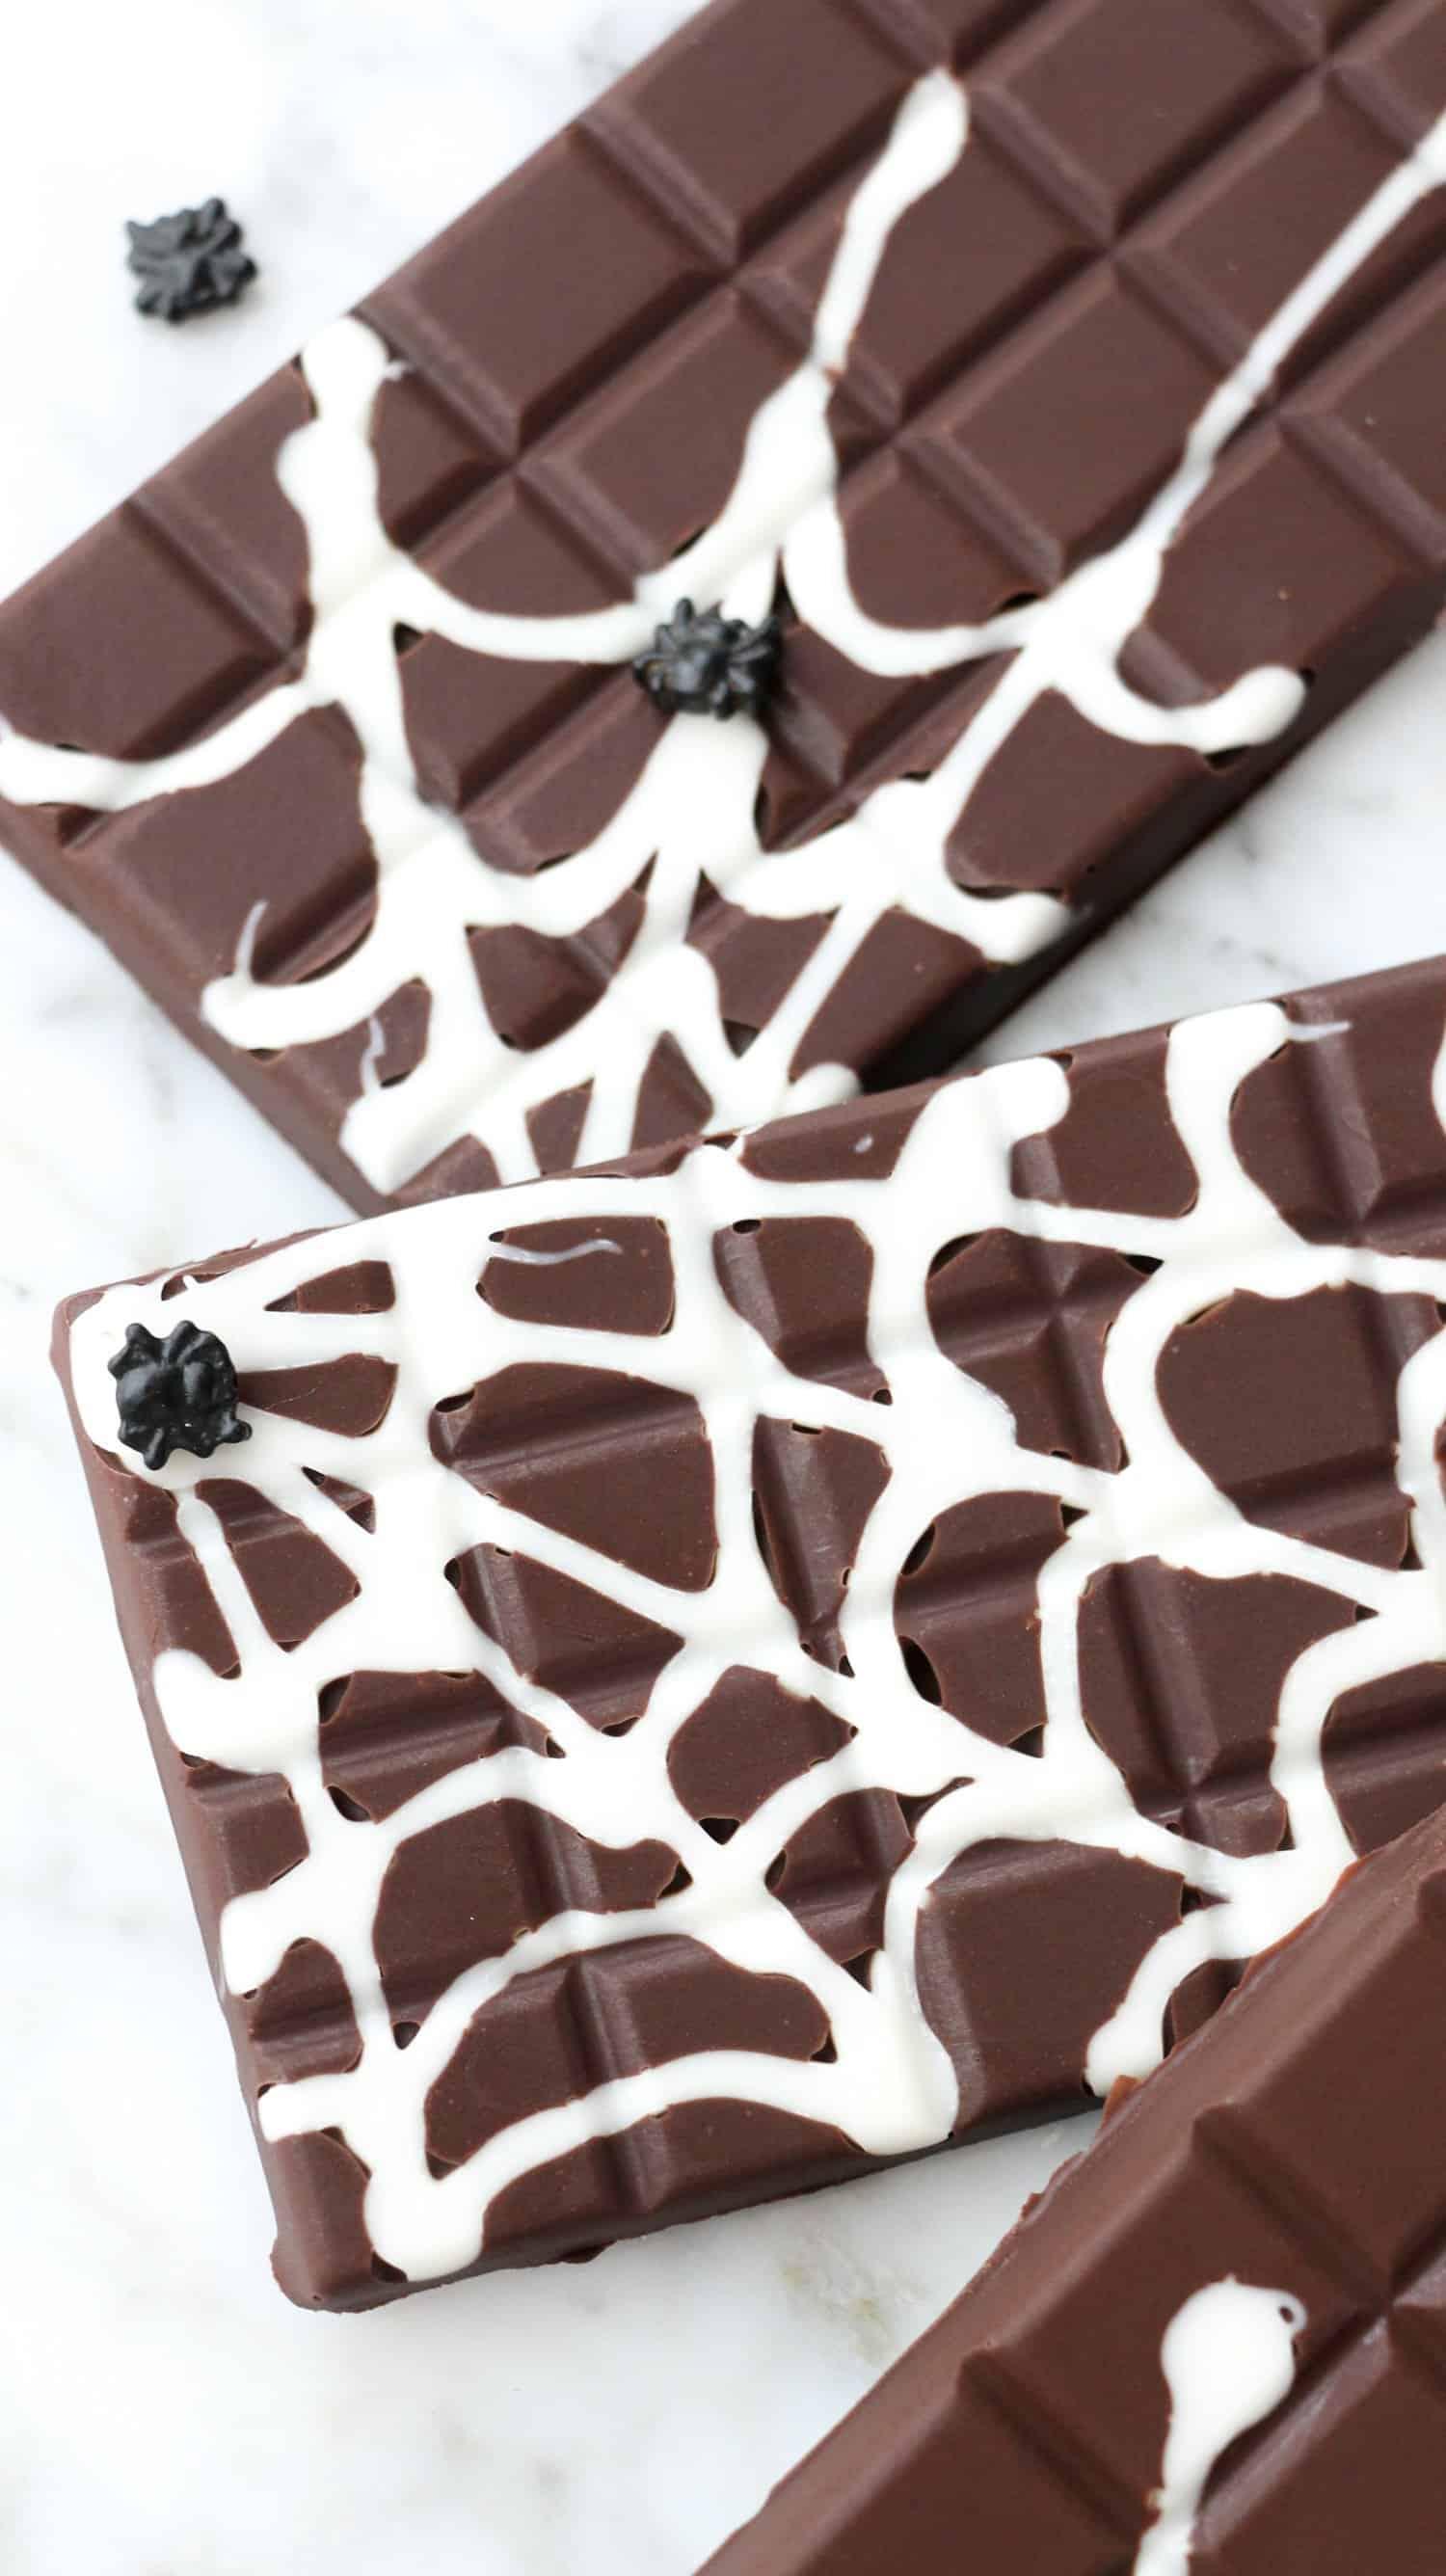 Diy Spider Web Chocolate Bars 6